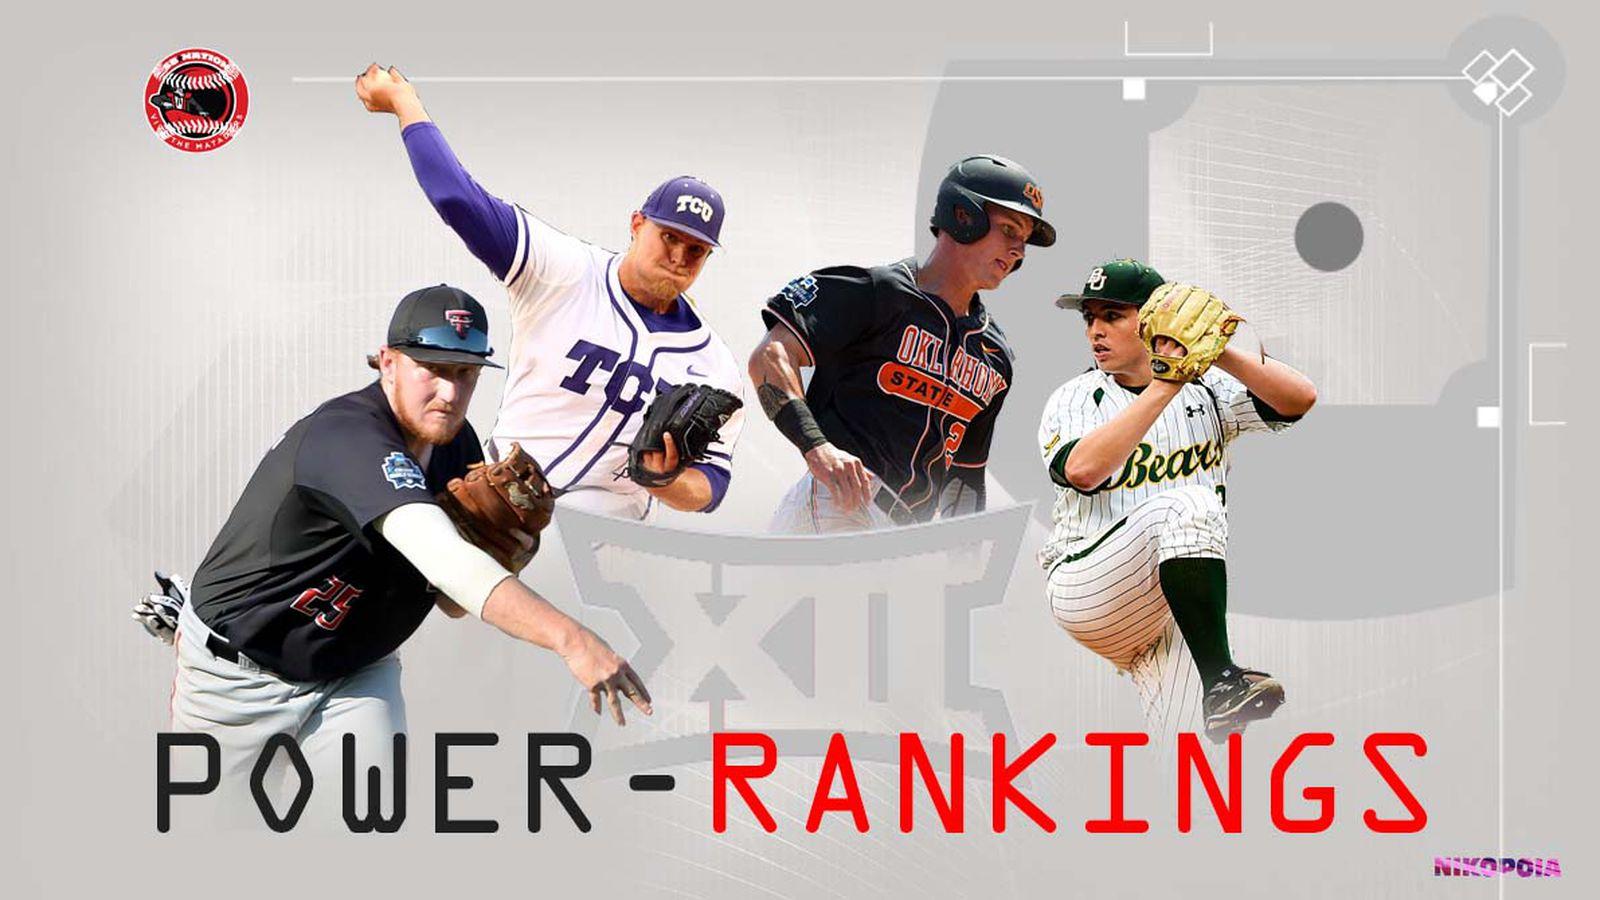 Baseball_power_rankings.0